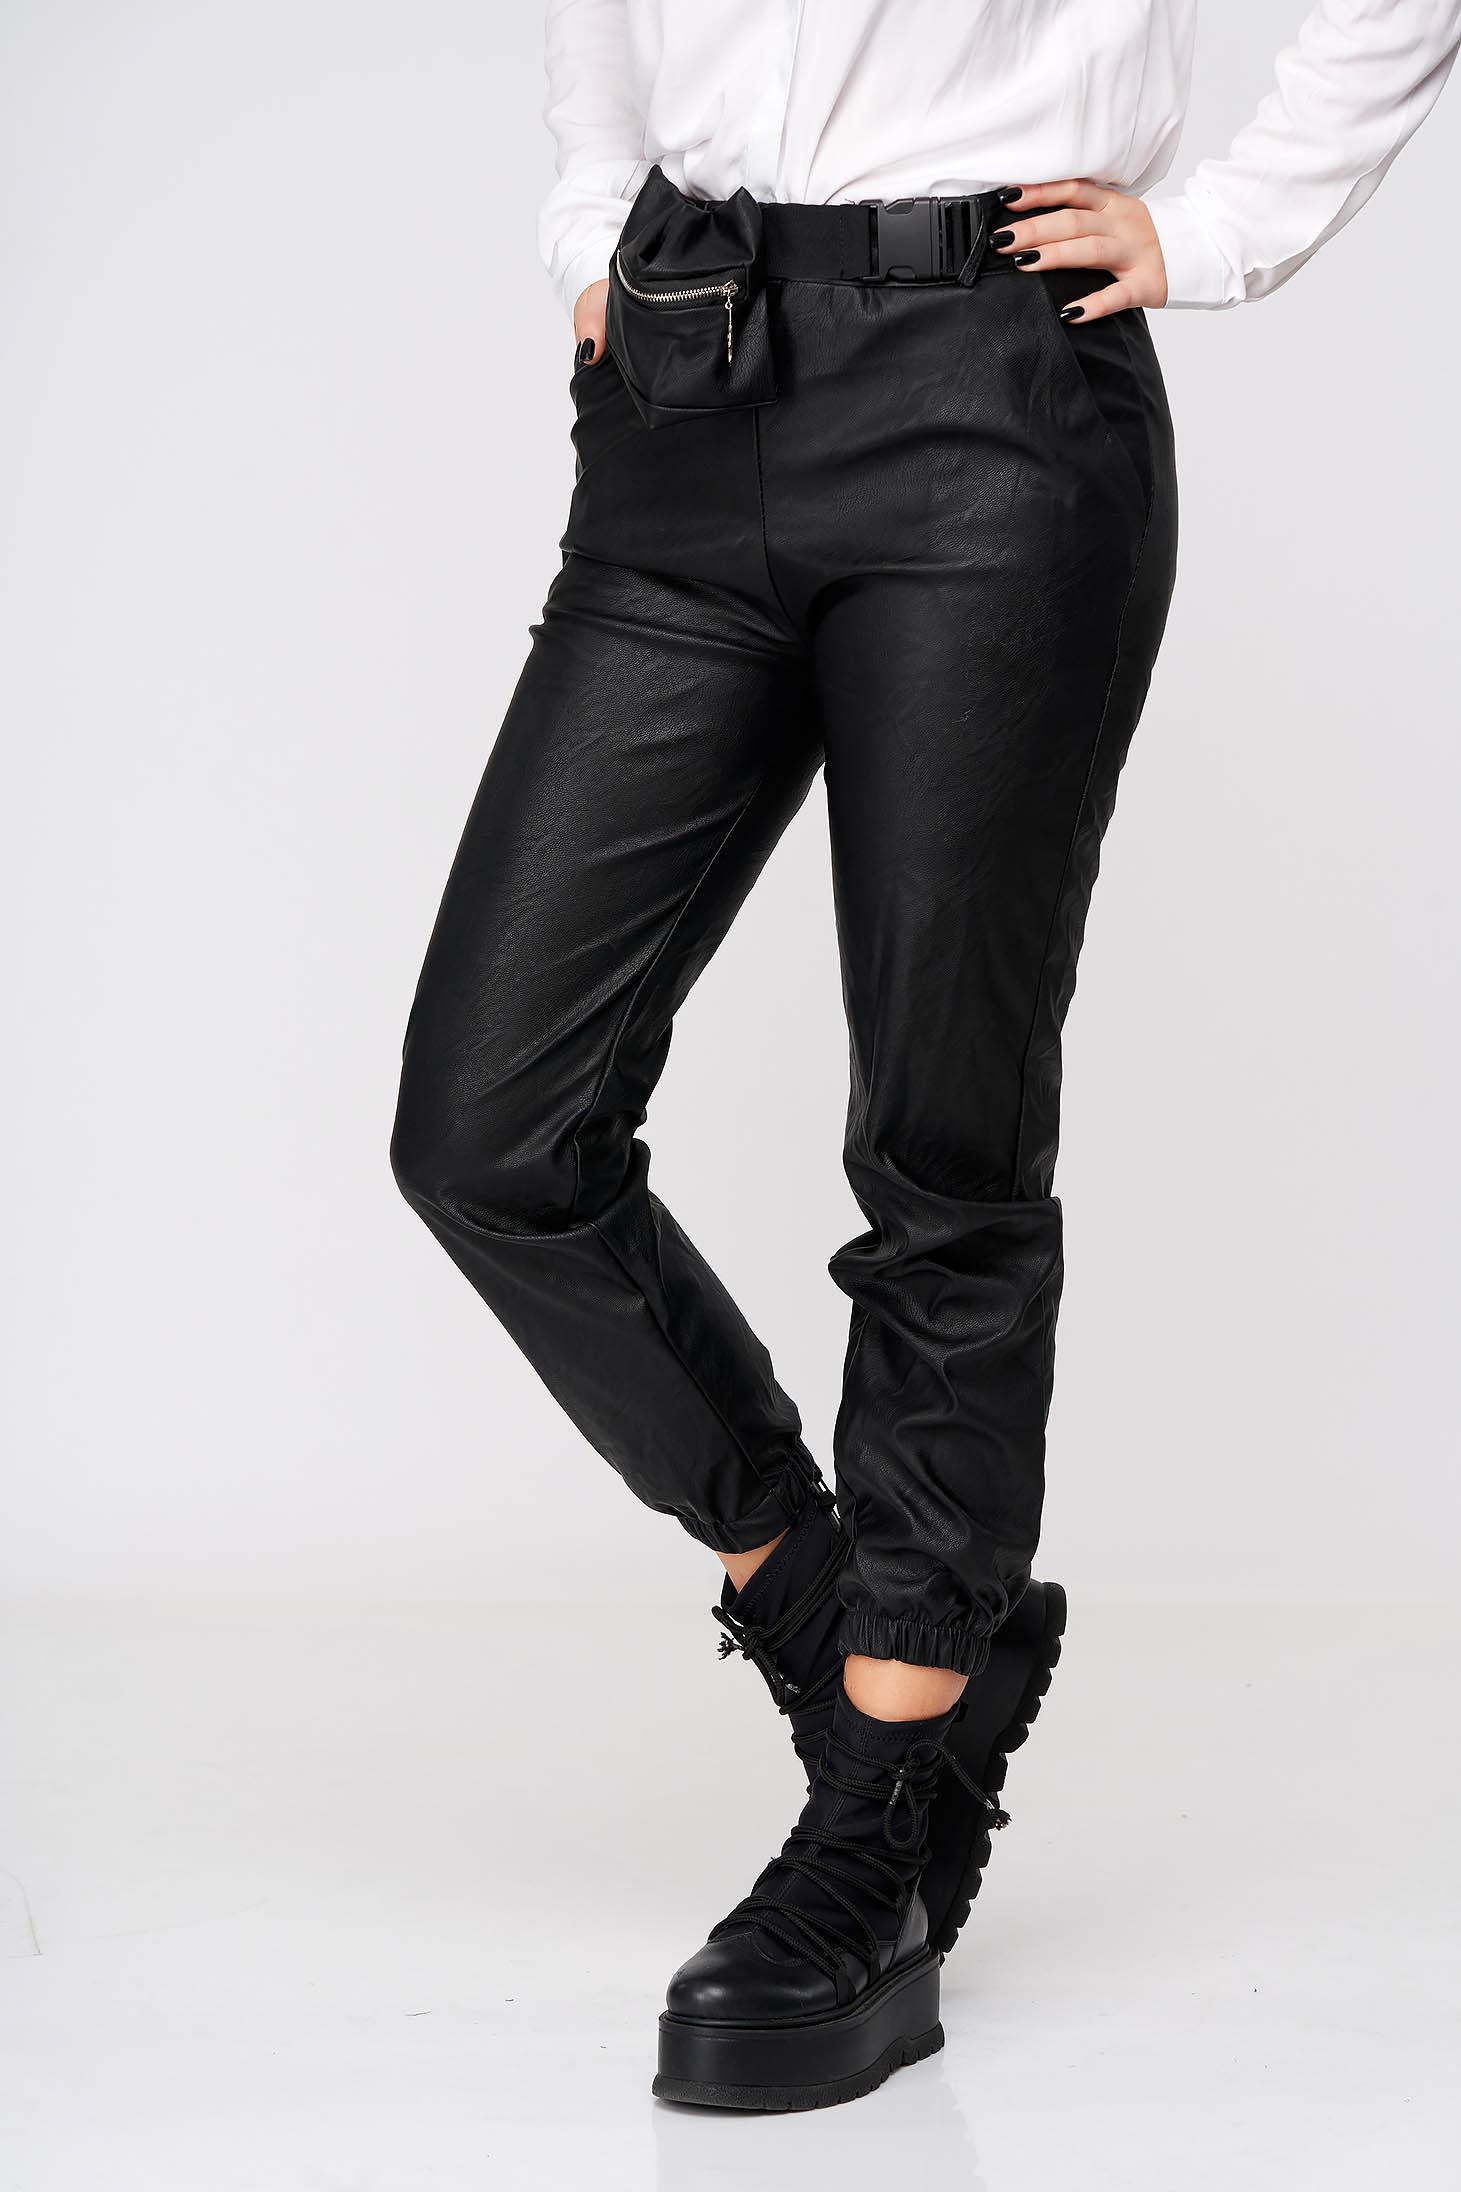 Fekete casual nadrág műbőrből magas derekú övvel ellátva